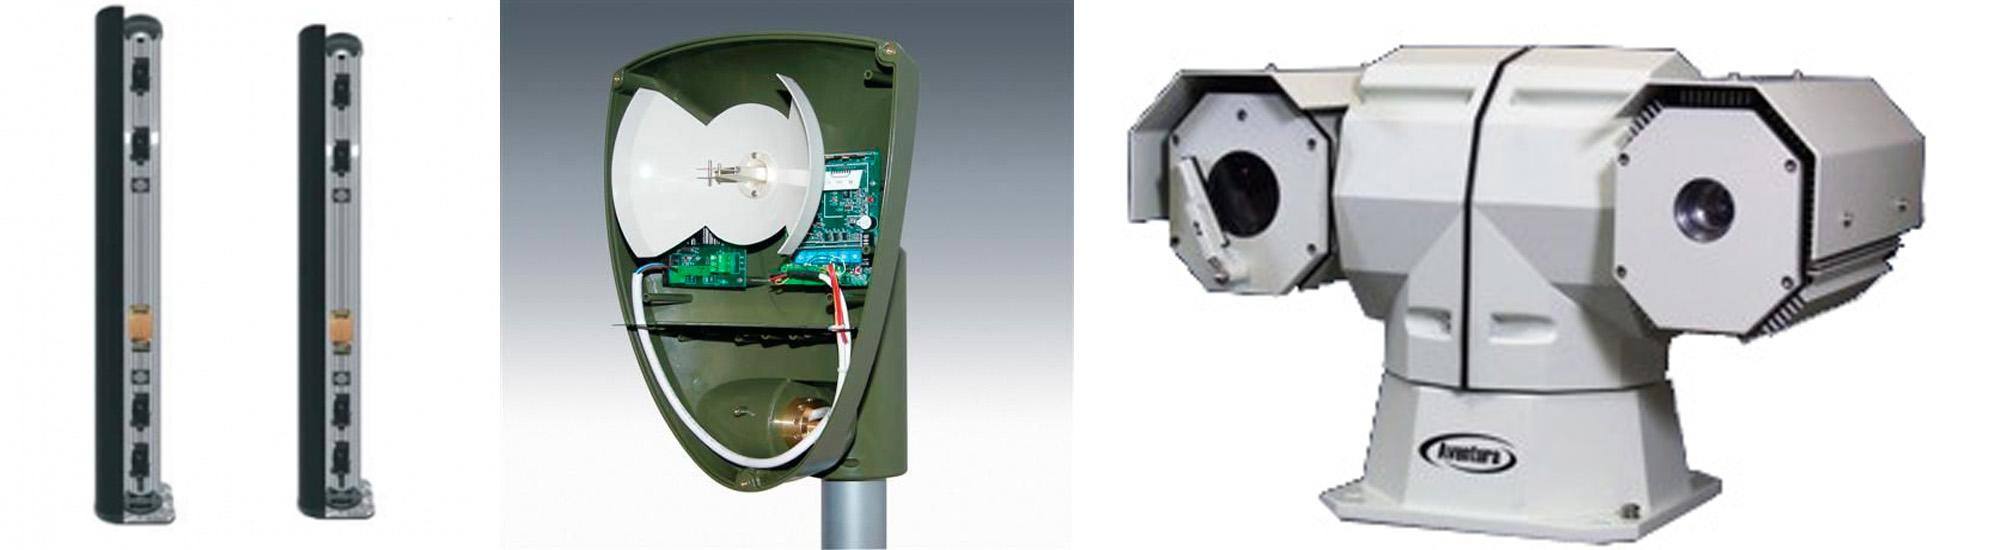 Hightech Monitoring Equipment